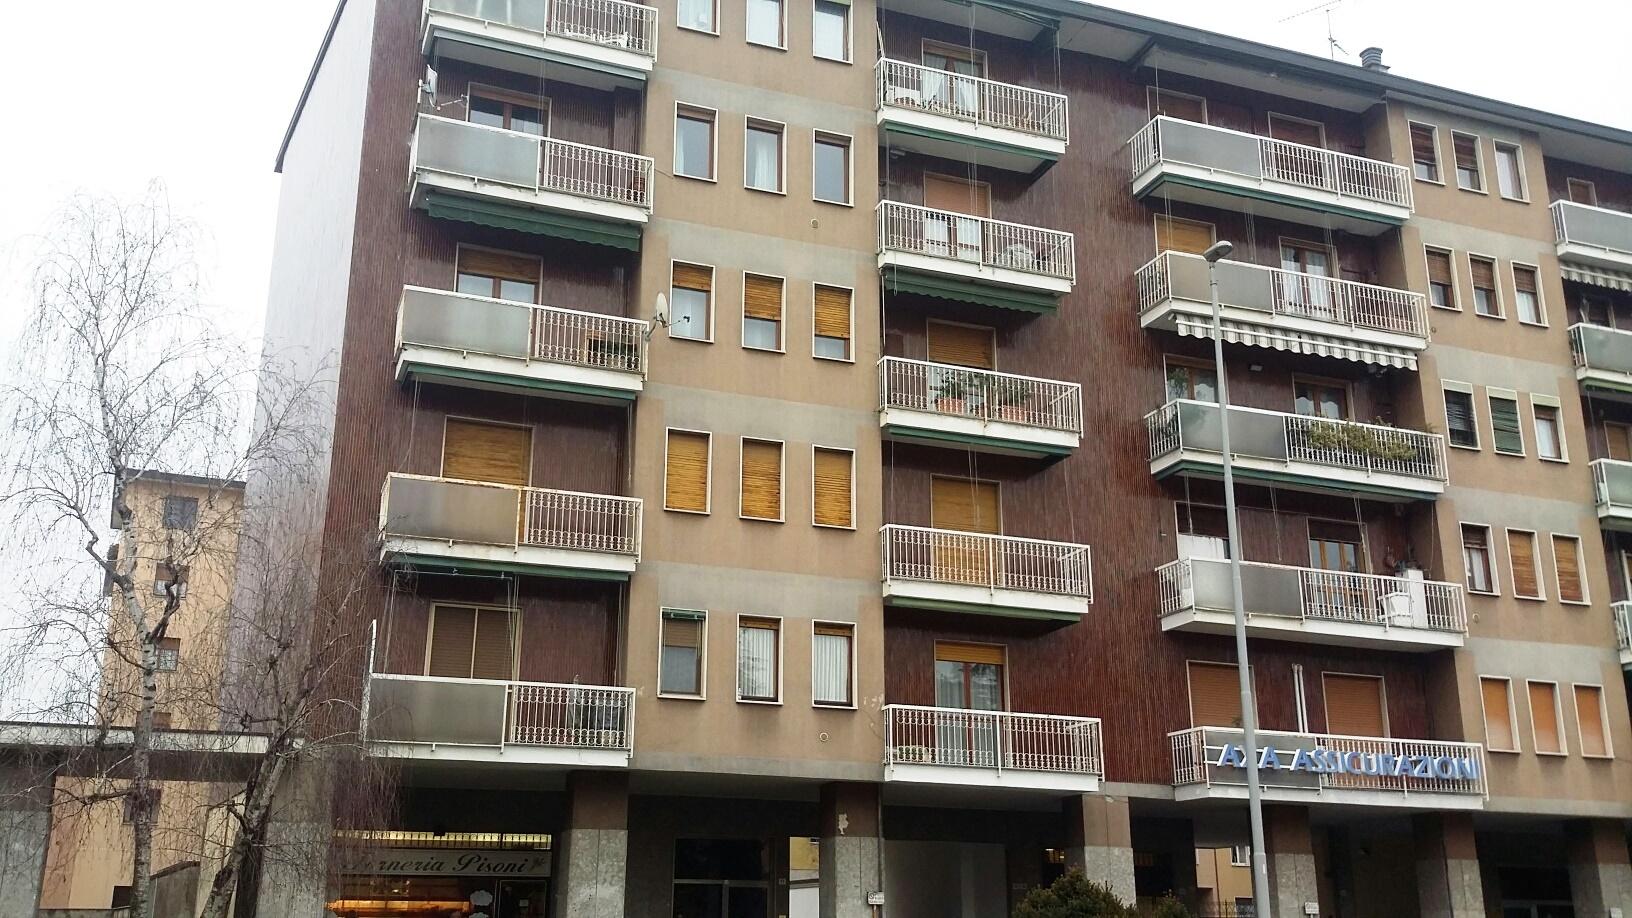 Magenta | Appartamento in Vendita in piazza kennedy | lacasadimilano.it